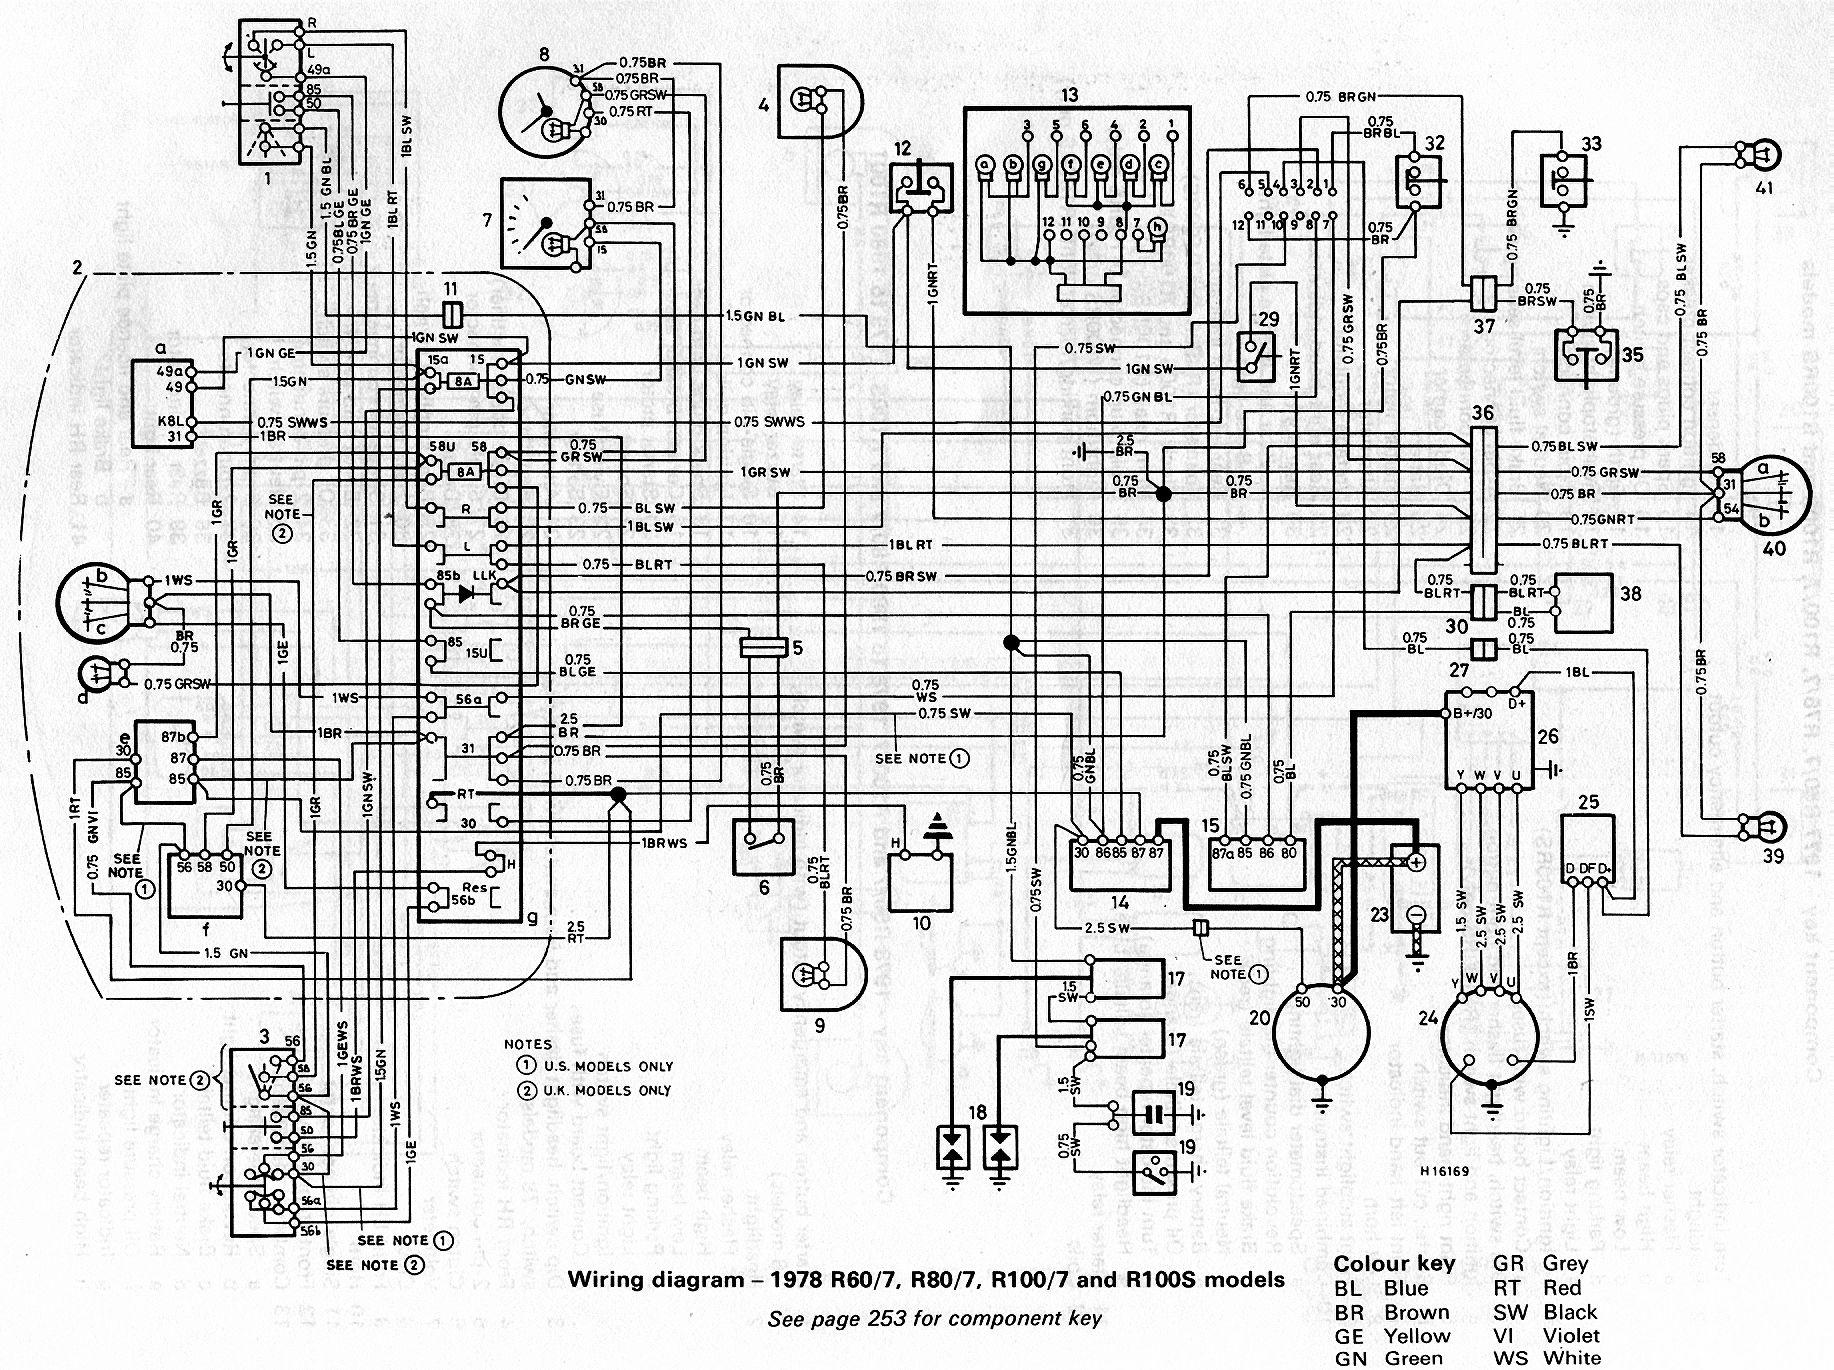 Bmw 1984 R80 7 Wiring Diagram Chassis Wire Harness Bmw R Airhead R60 R75 R80 R100 61 11 1 Likewise Bmw E46 Bmw New Bmw